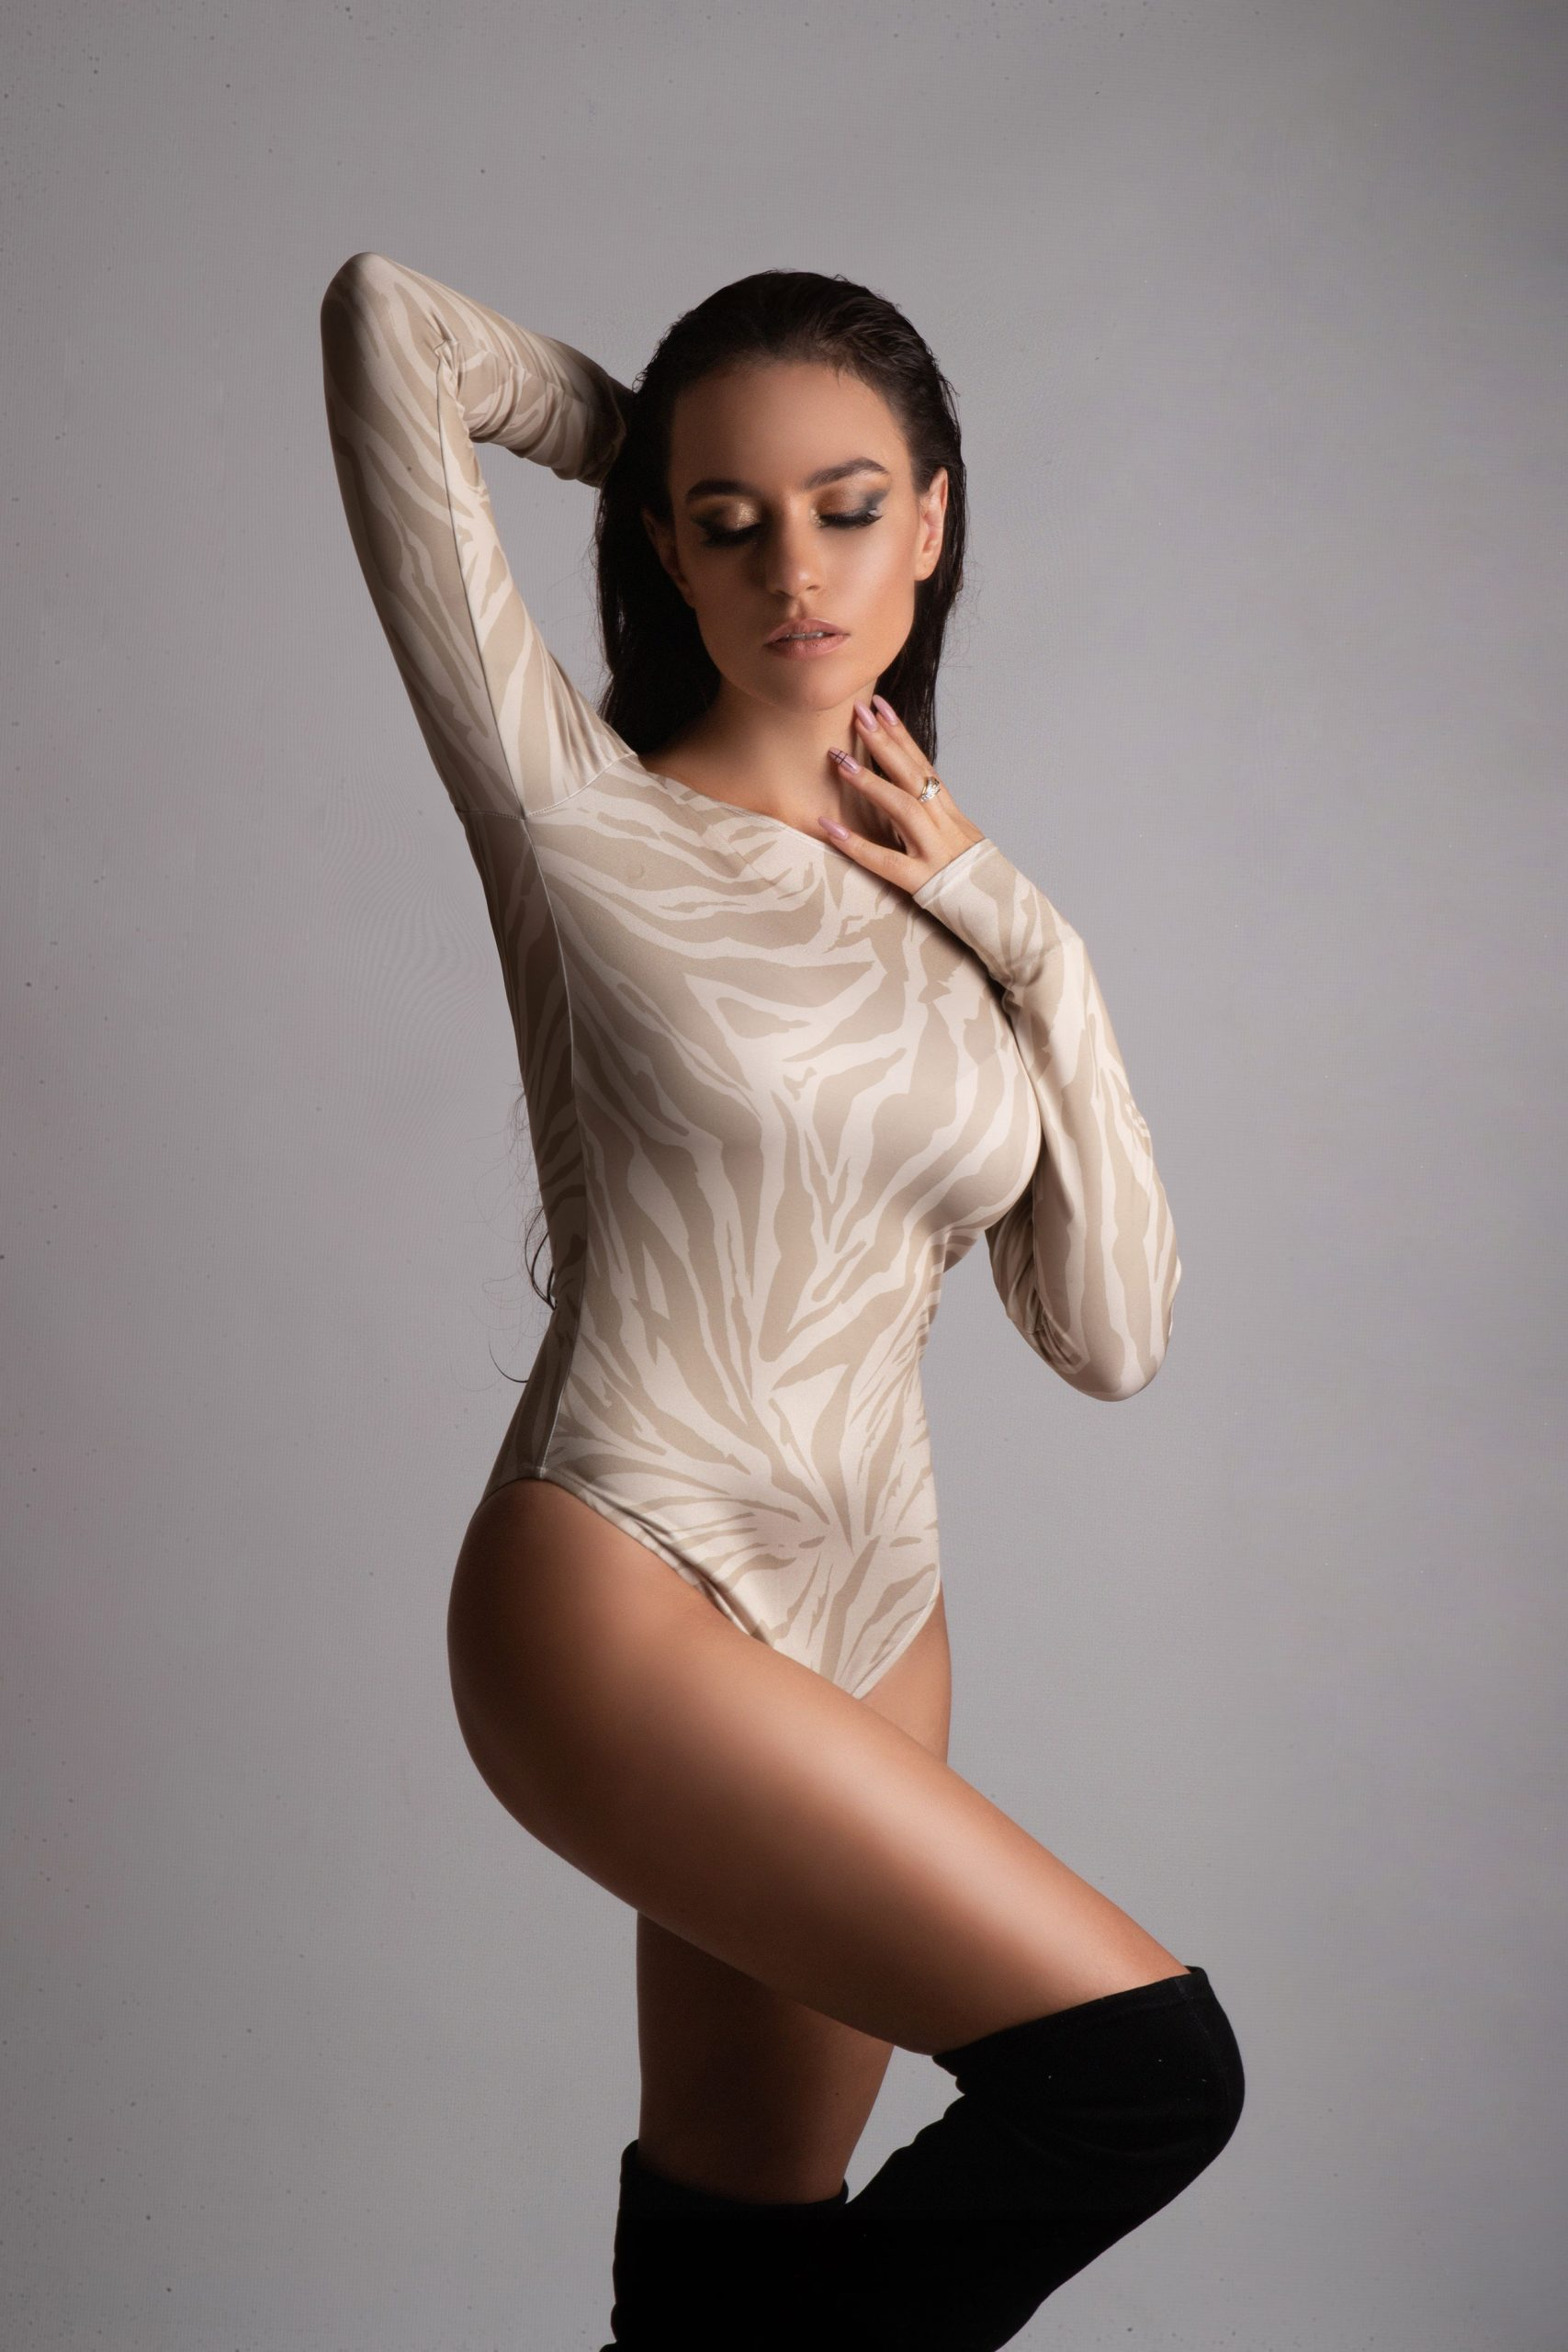 Sexy Eva Murati as a celebrity Endorsement